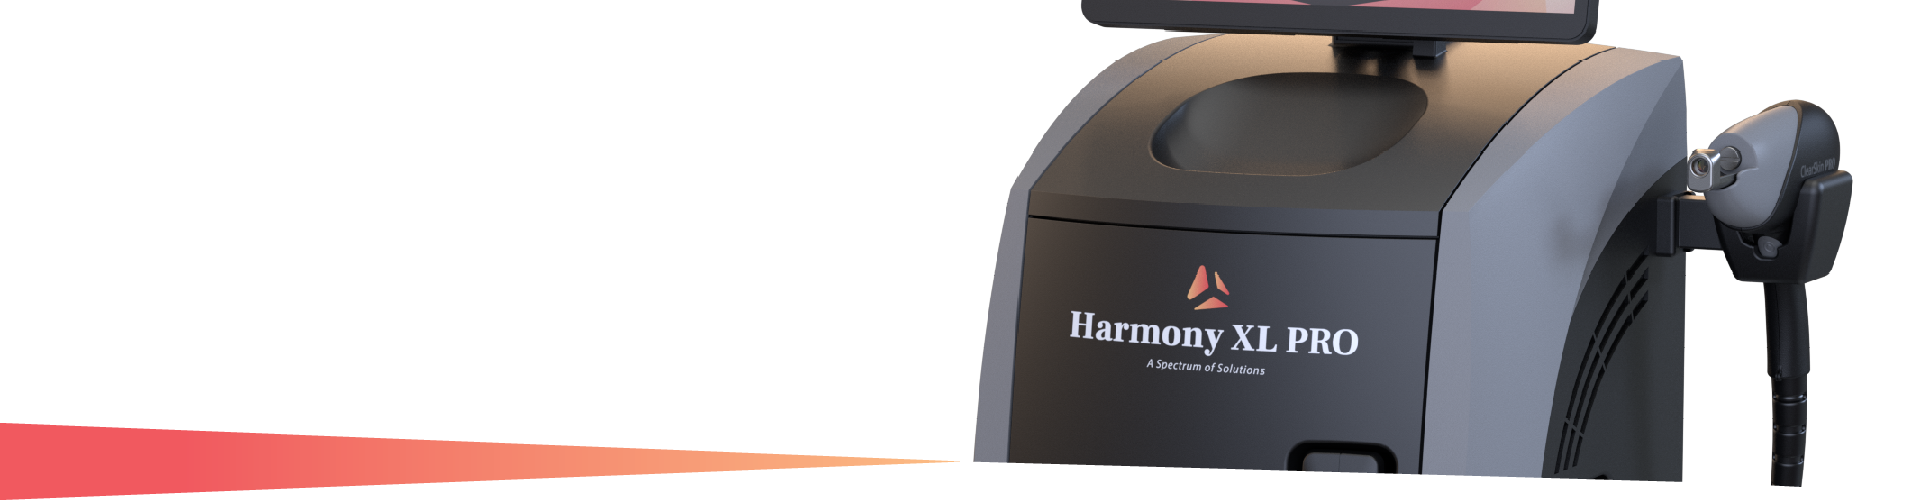 Harmony XL PRO SE desktop header